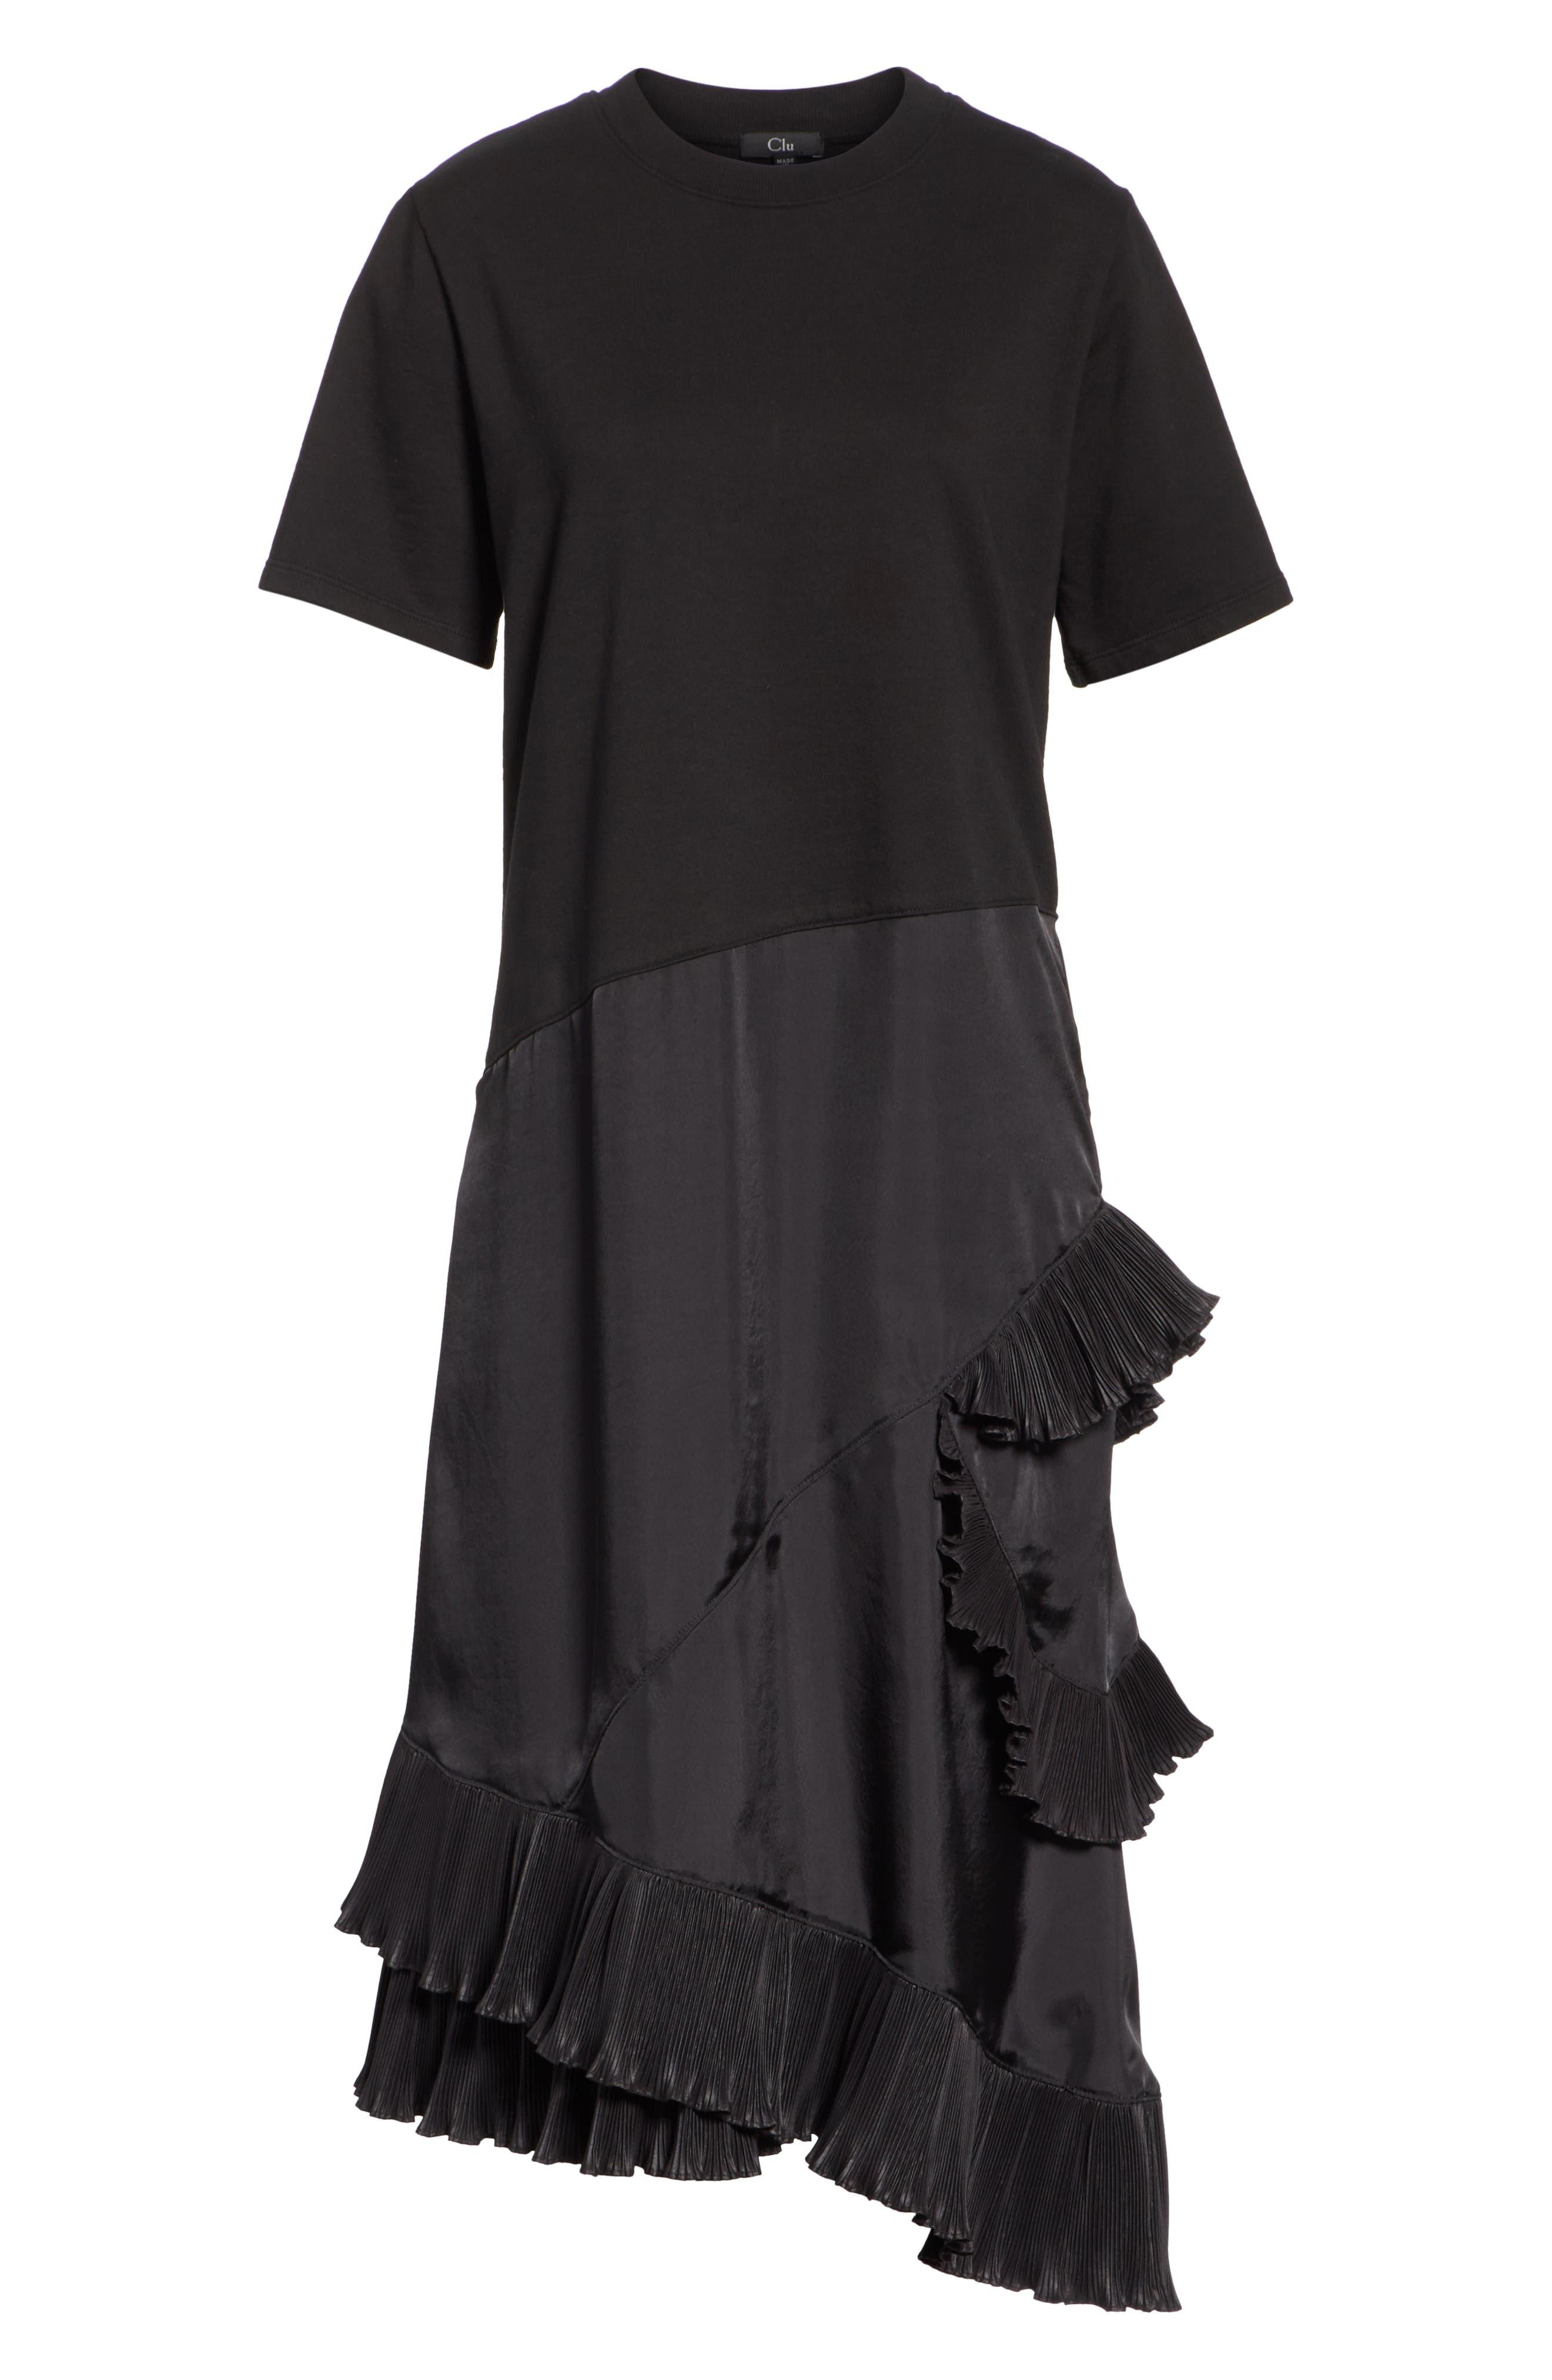 Pleat Ruffle Trim Asymmetrical Dress,                             Alternate thumbnail 6, color,                             Black/ Black